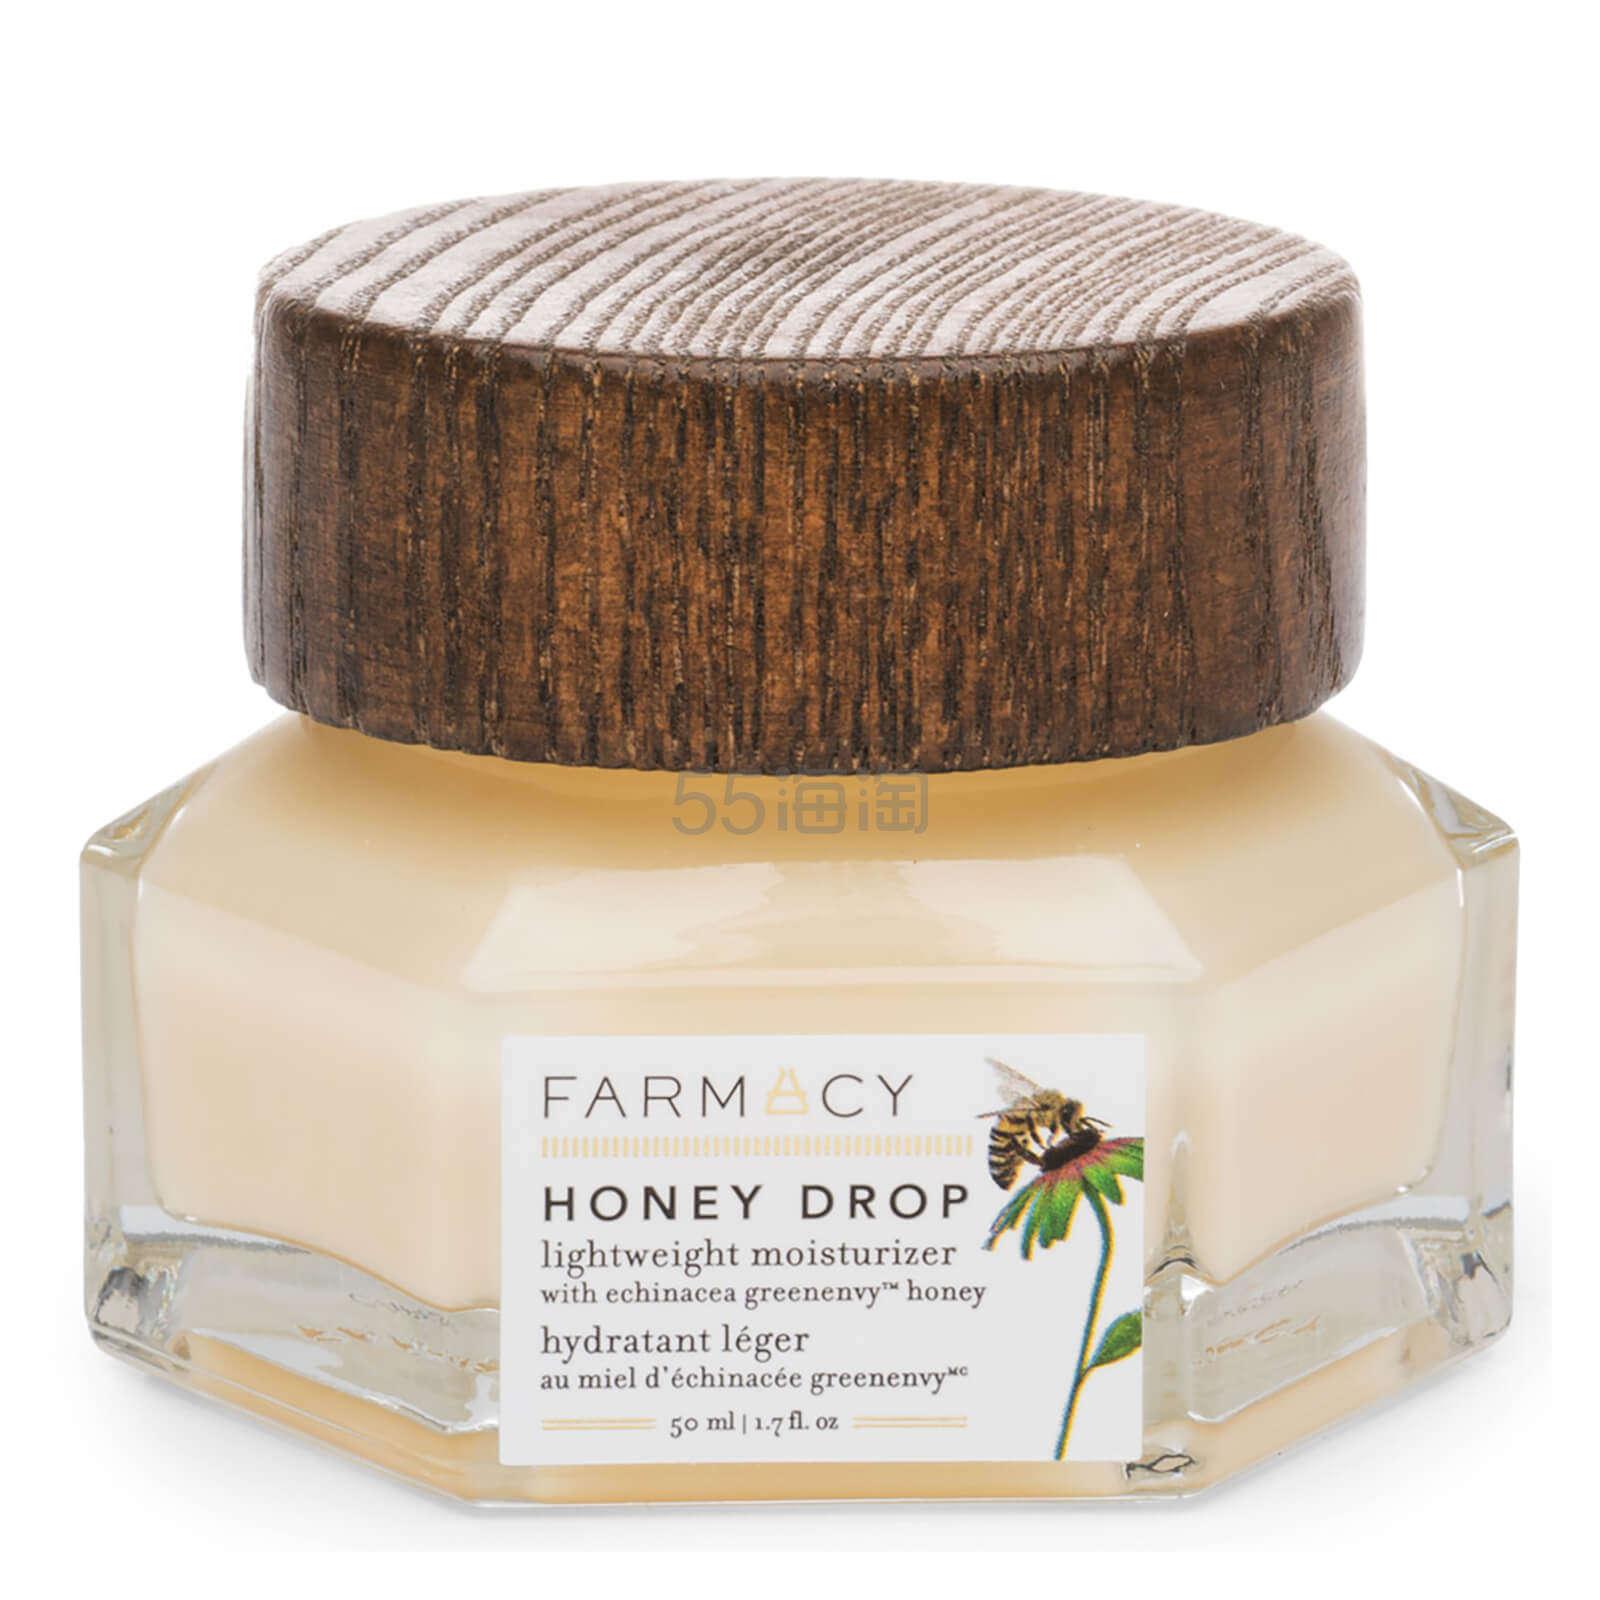 Farmacy 蜂蜜水润面霜 50ml £29.4(约249元) - 海淘优惠海淘折扣|55海淘网